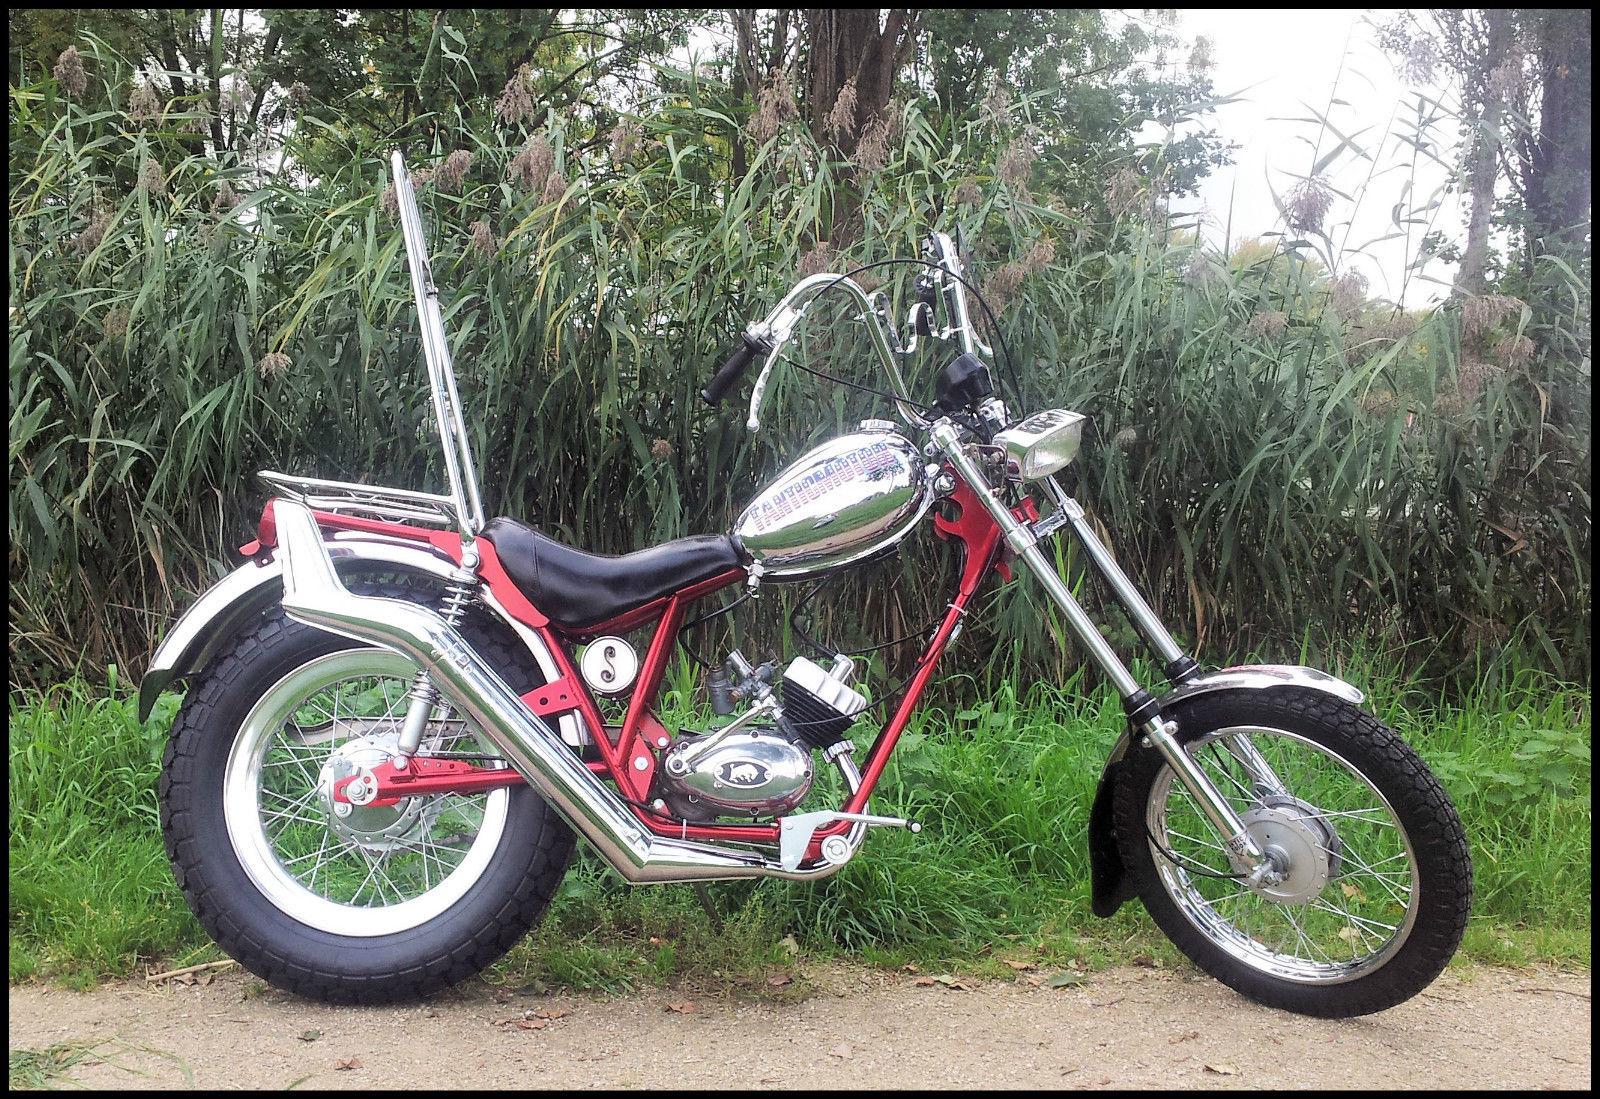 Restored Fantic Chopper - 1973 Photographs at Classic Bikes Restored |Bikes Restored